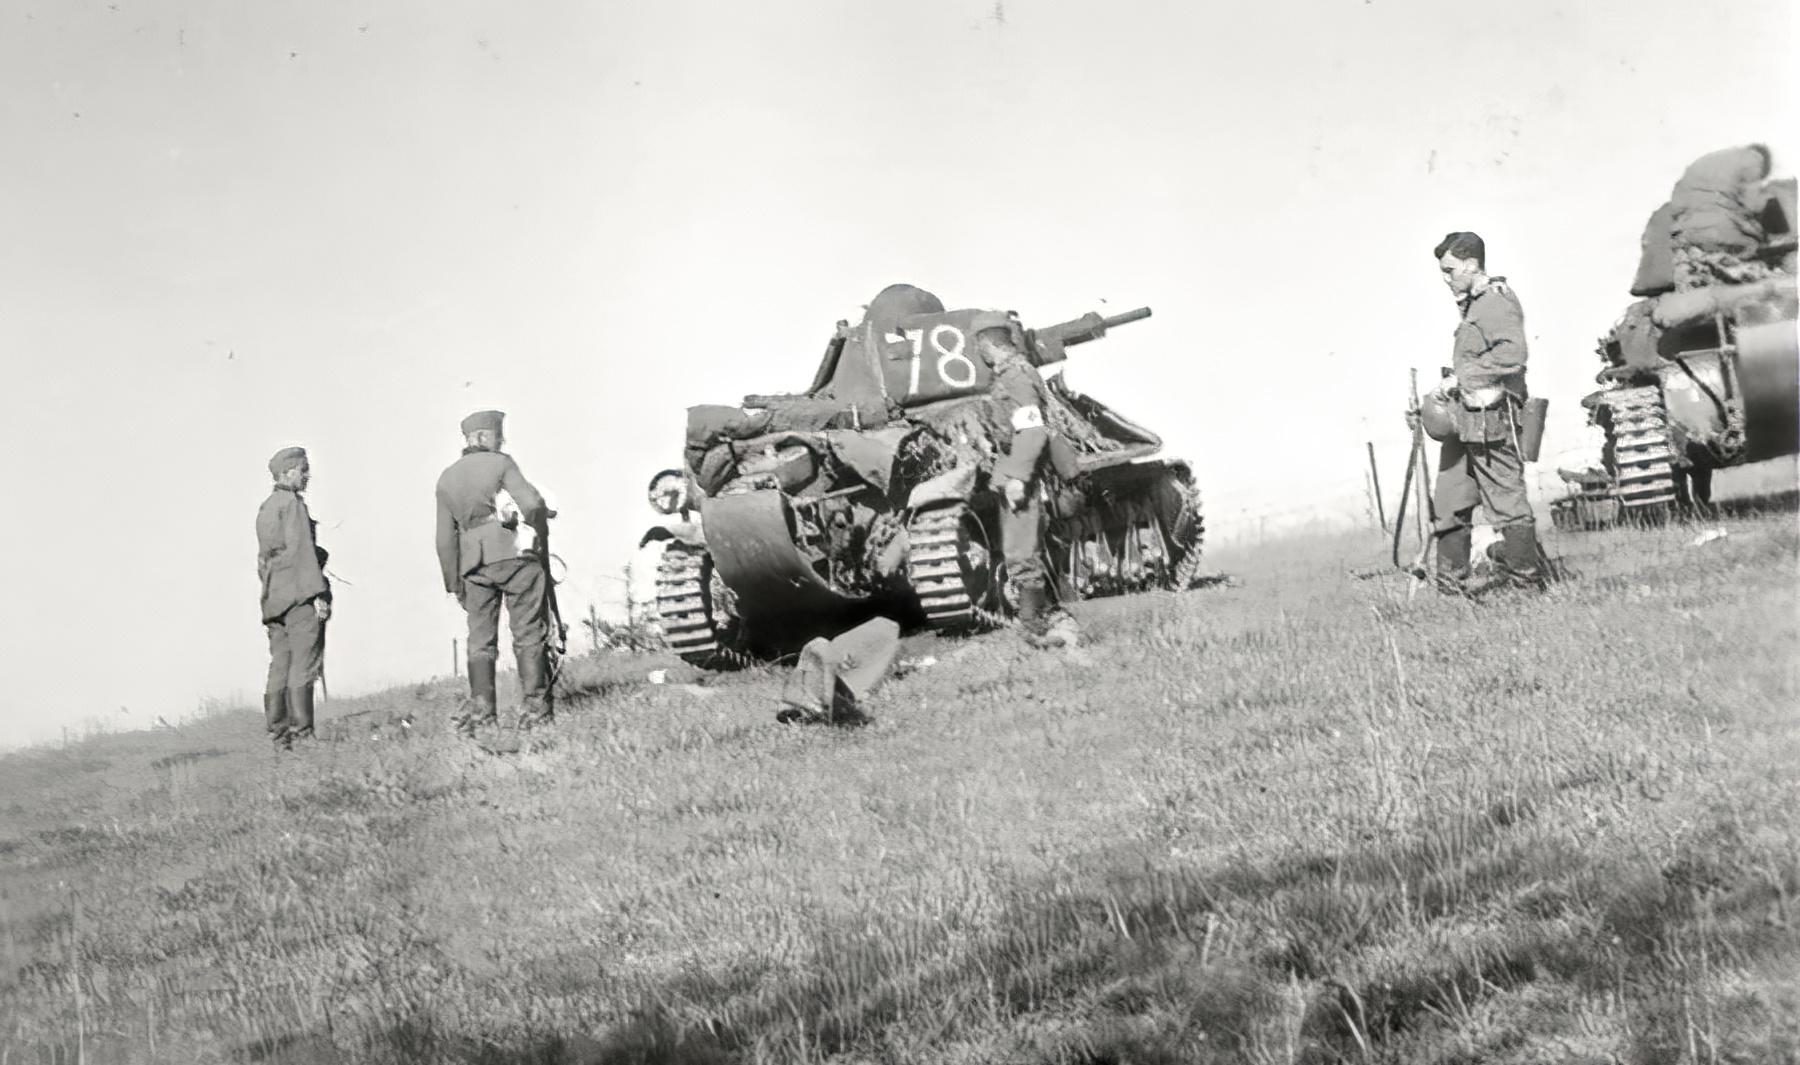 French Army Hotchkiss H39 White 78 captured battle of France 1940 ebay 01